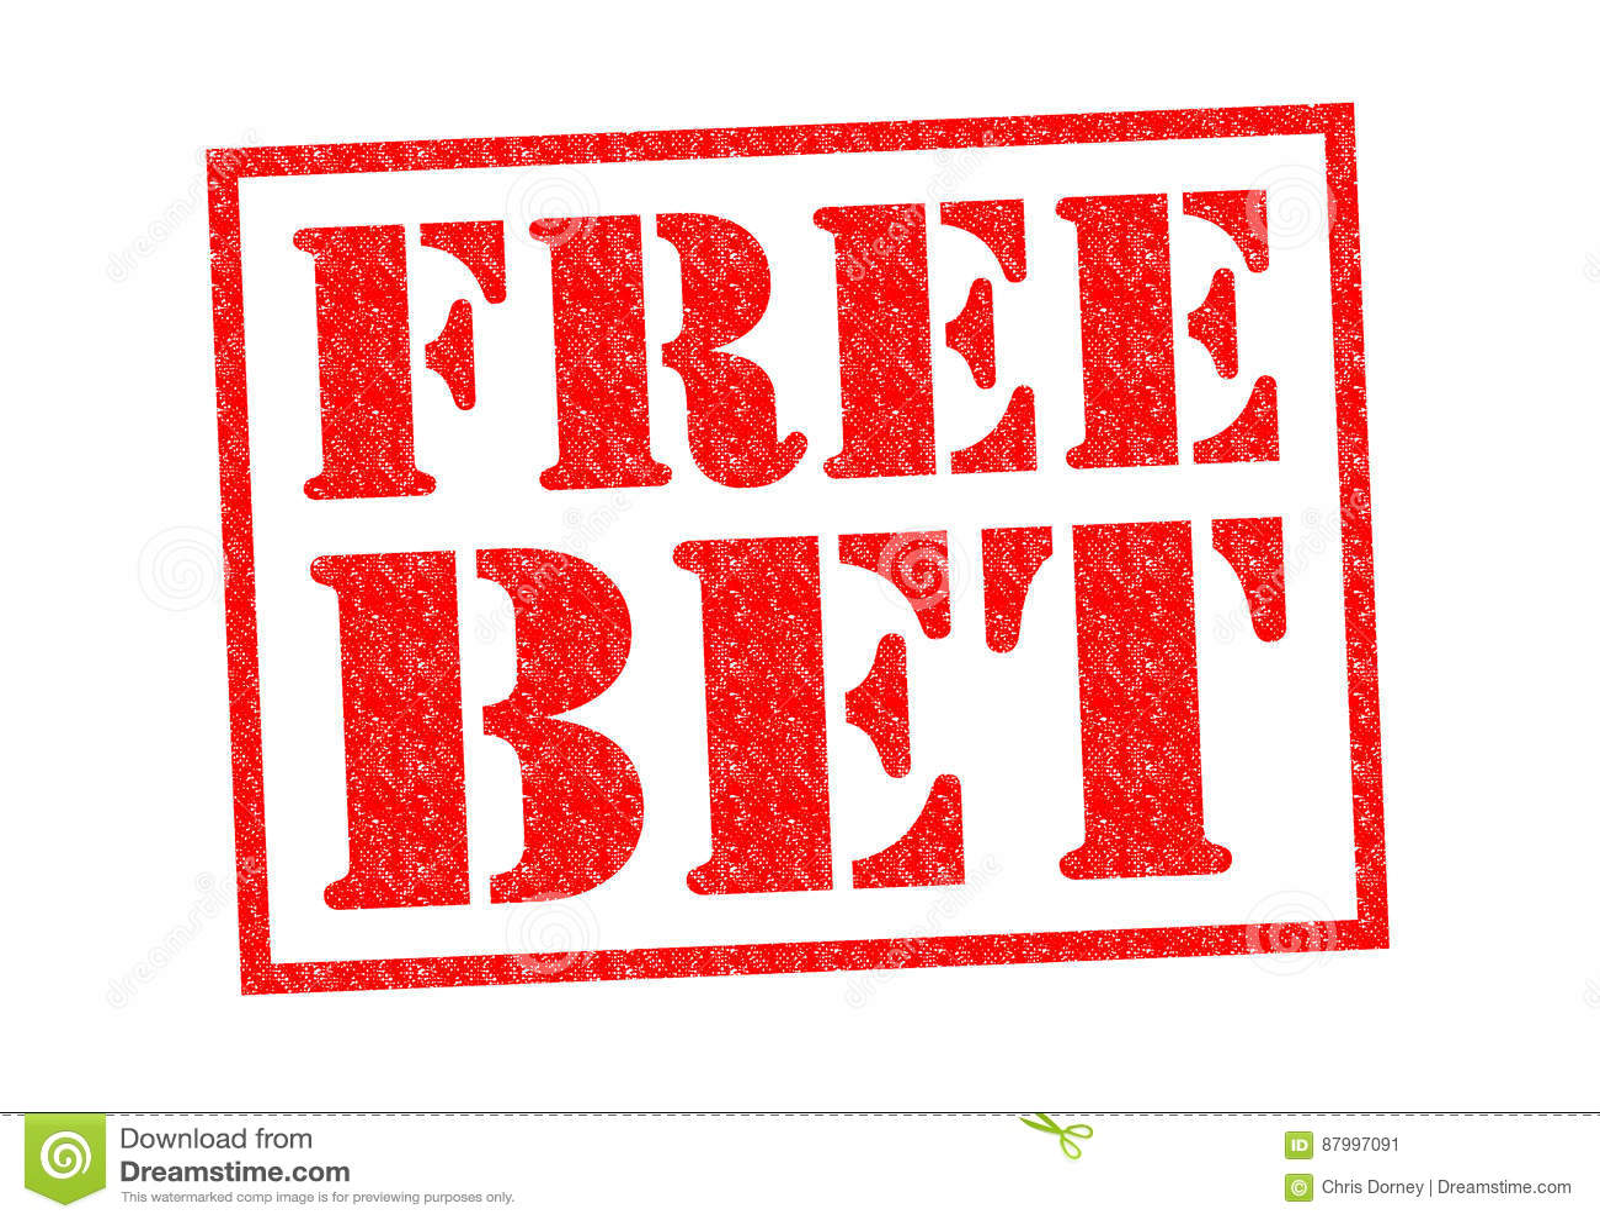 Freebet senza deposito